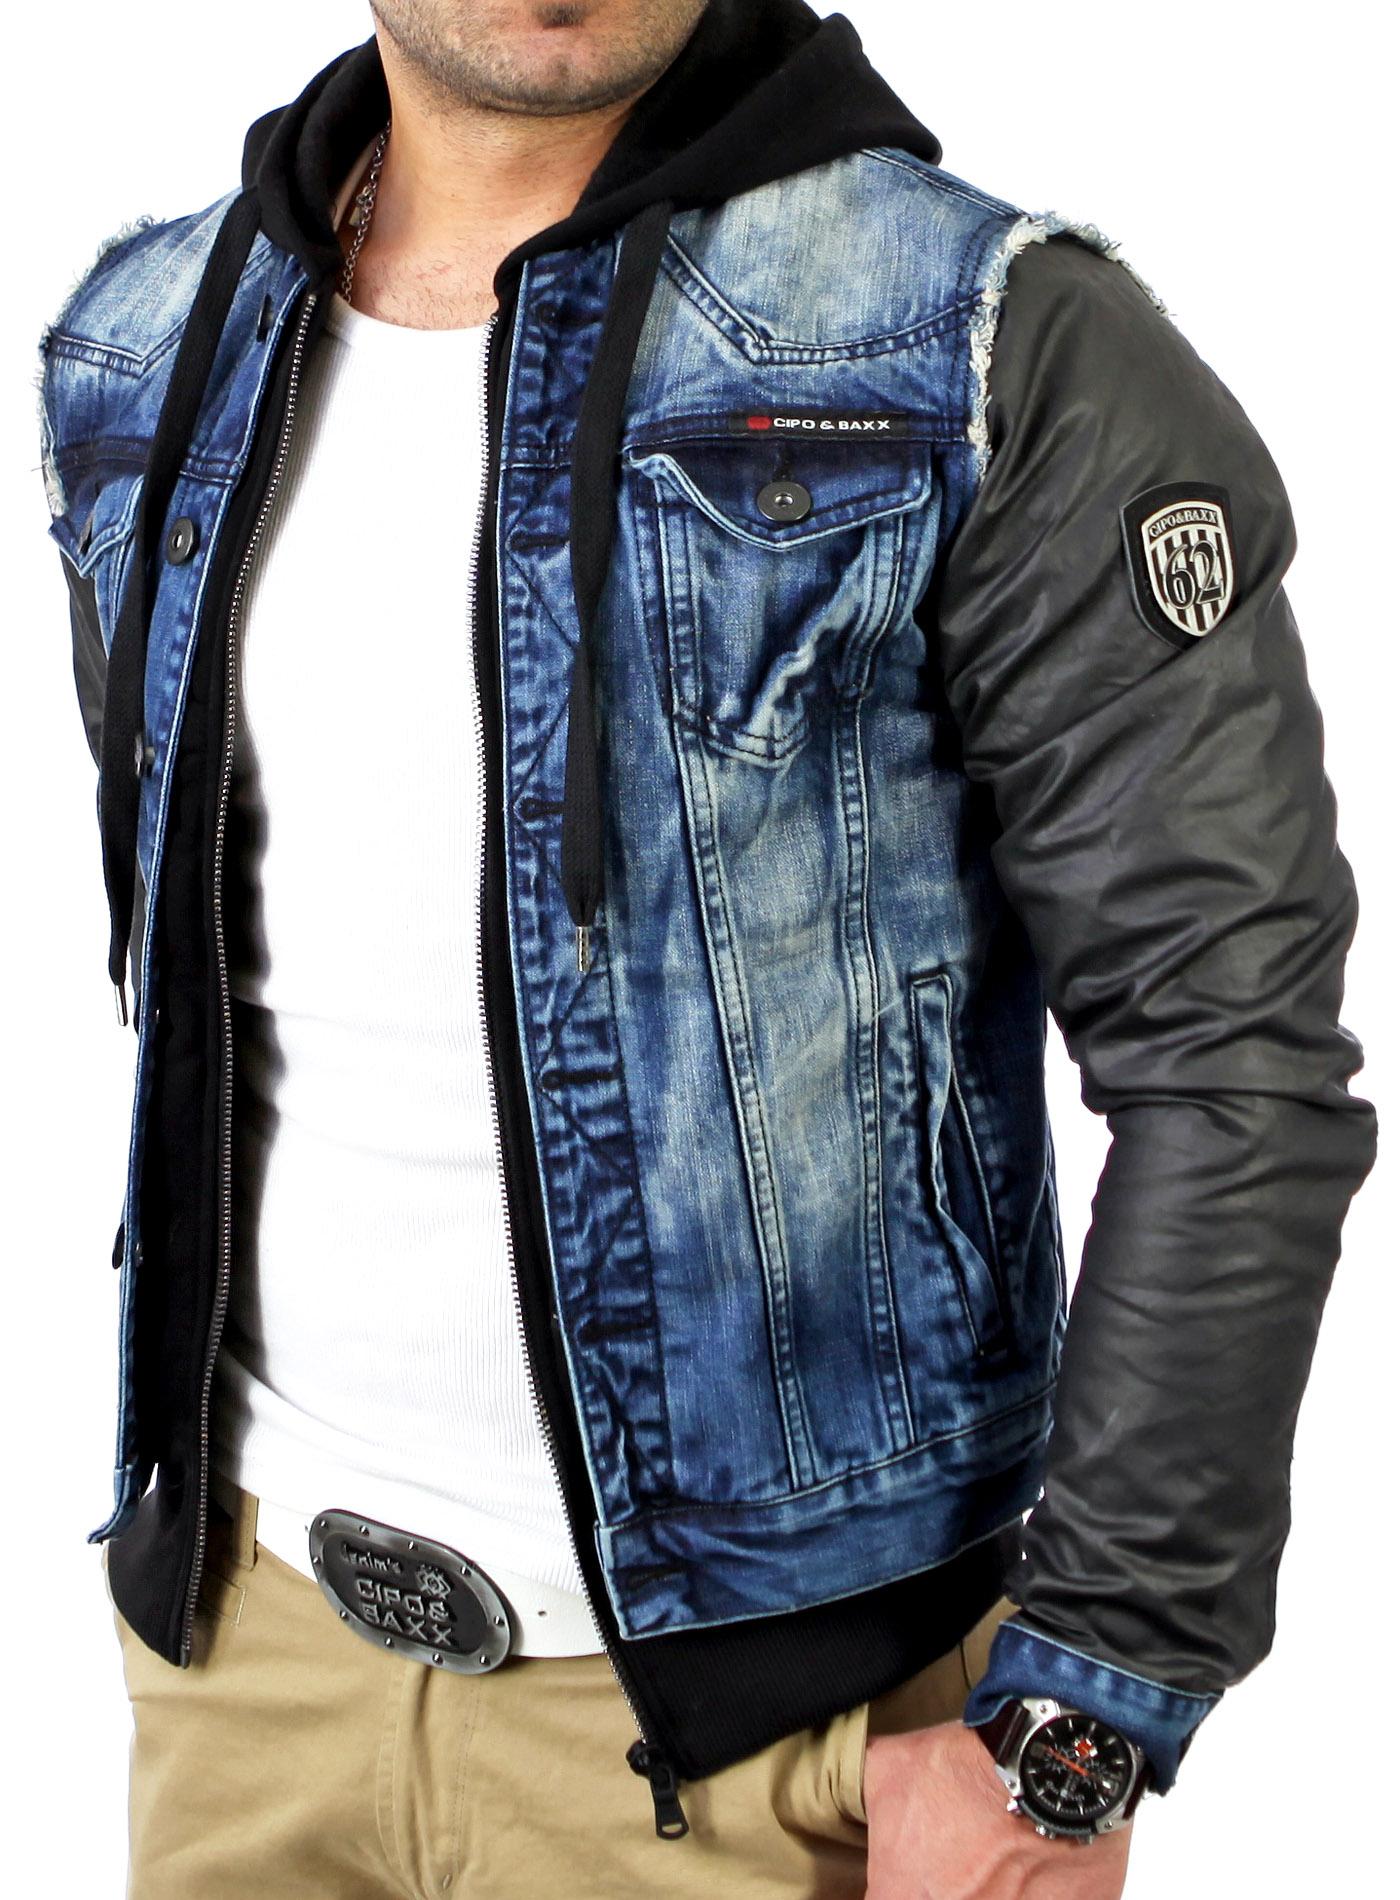 cipo baxx c 1290 herren 2in1 jeansjacke jeans jacke. Black Bedroom Furniture Sets. Home Design Ideas